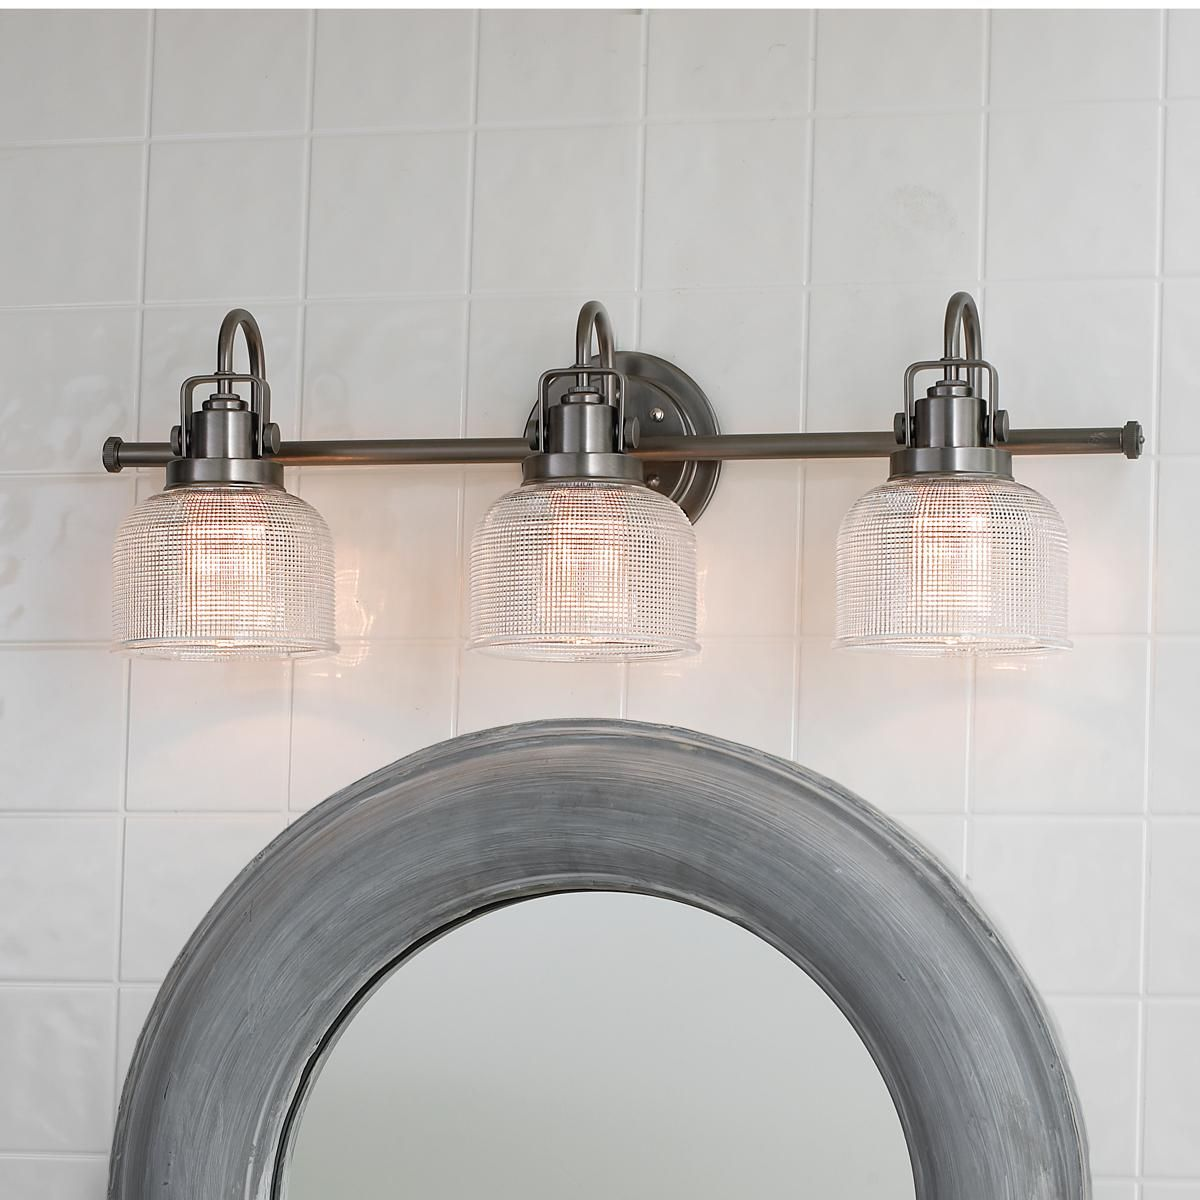 Fresnel glass restoration bath light 3 light vanity - American classic bathroom vanity ...